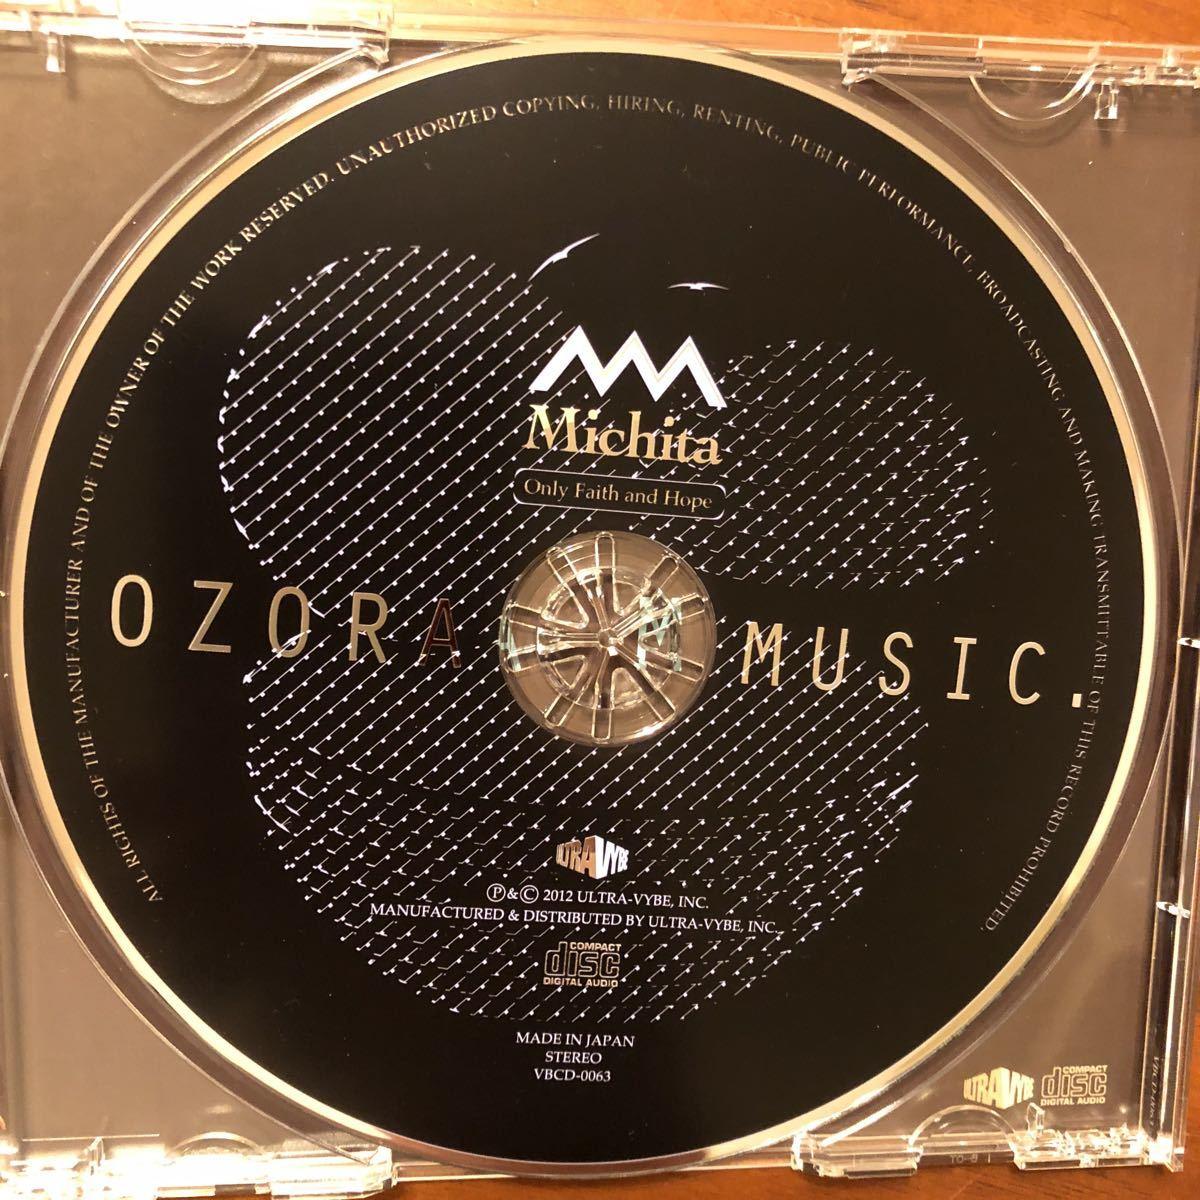 Michita / Only Faith and Hope OZORA MUSIC 海野ミカ MARRR KODAI THE MONK_画像4